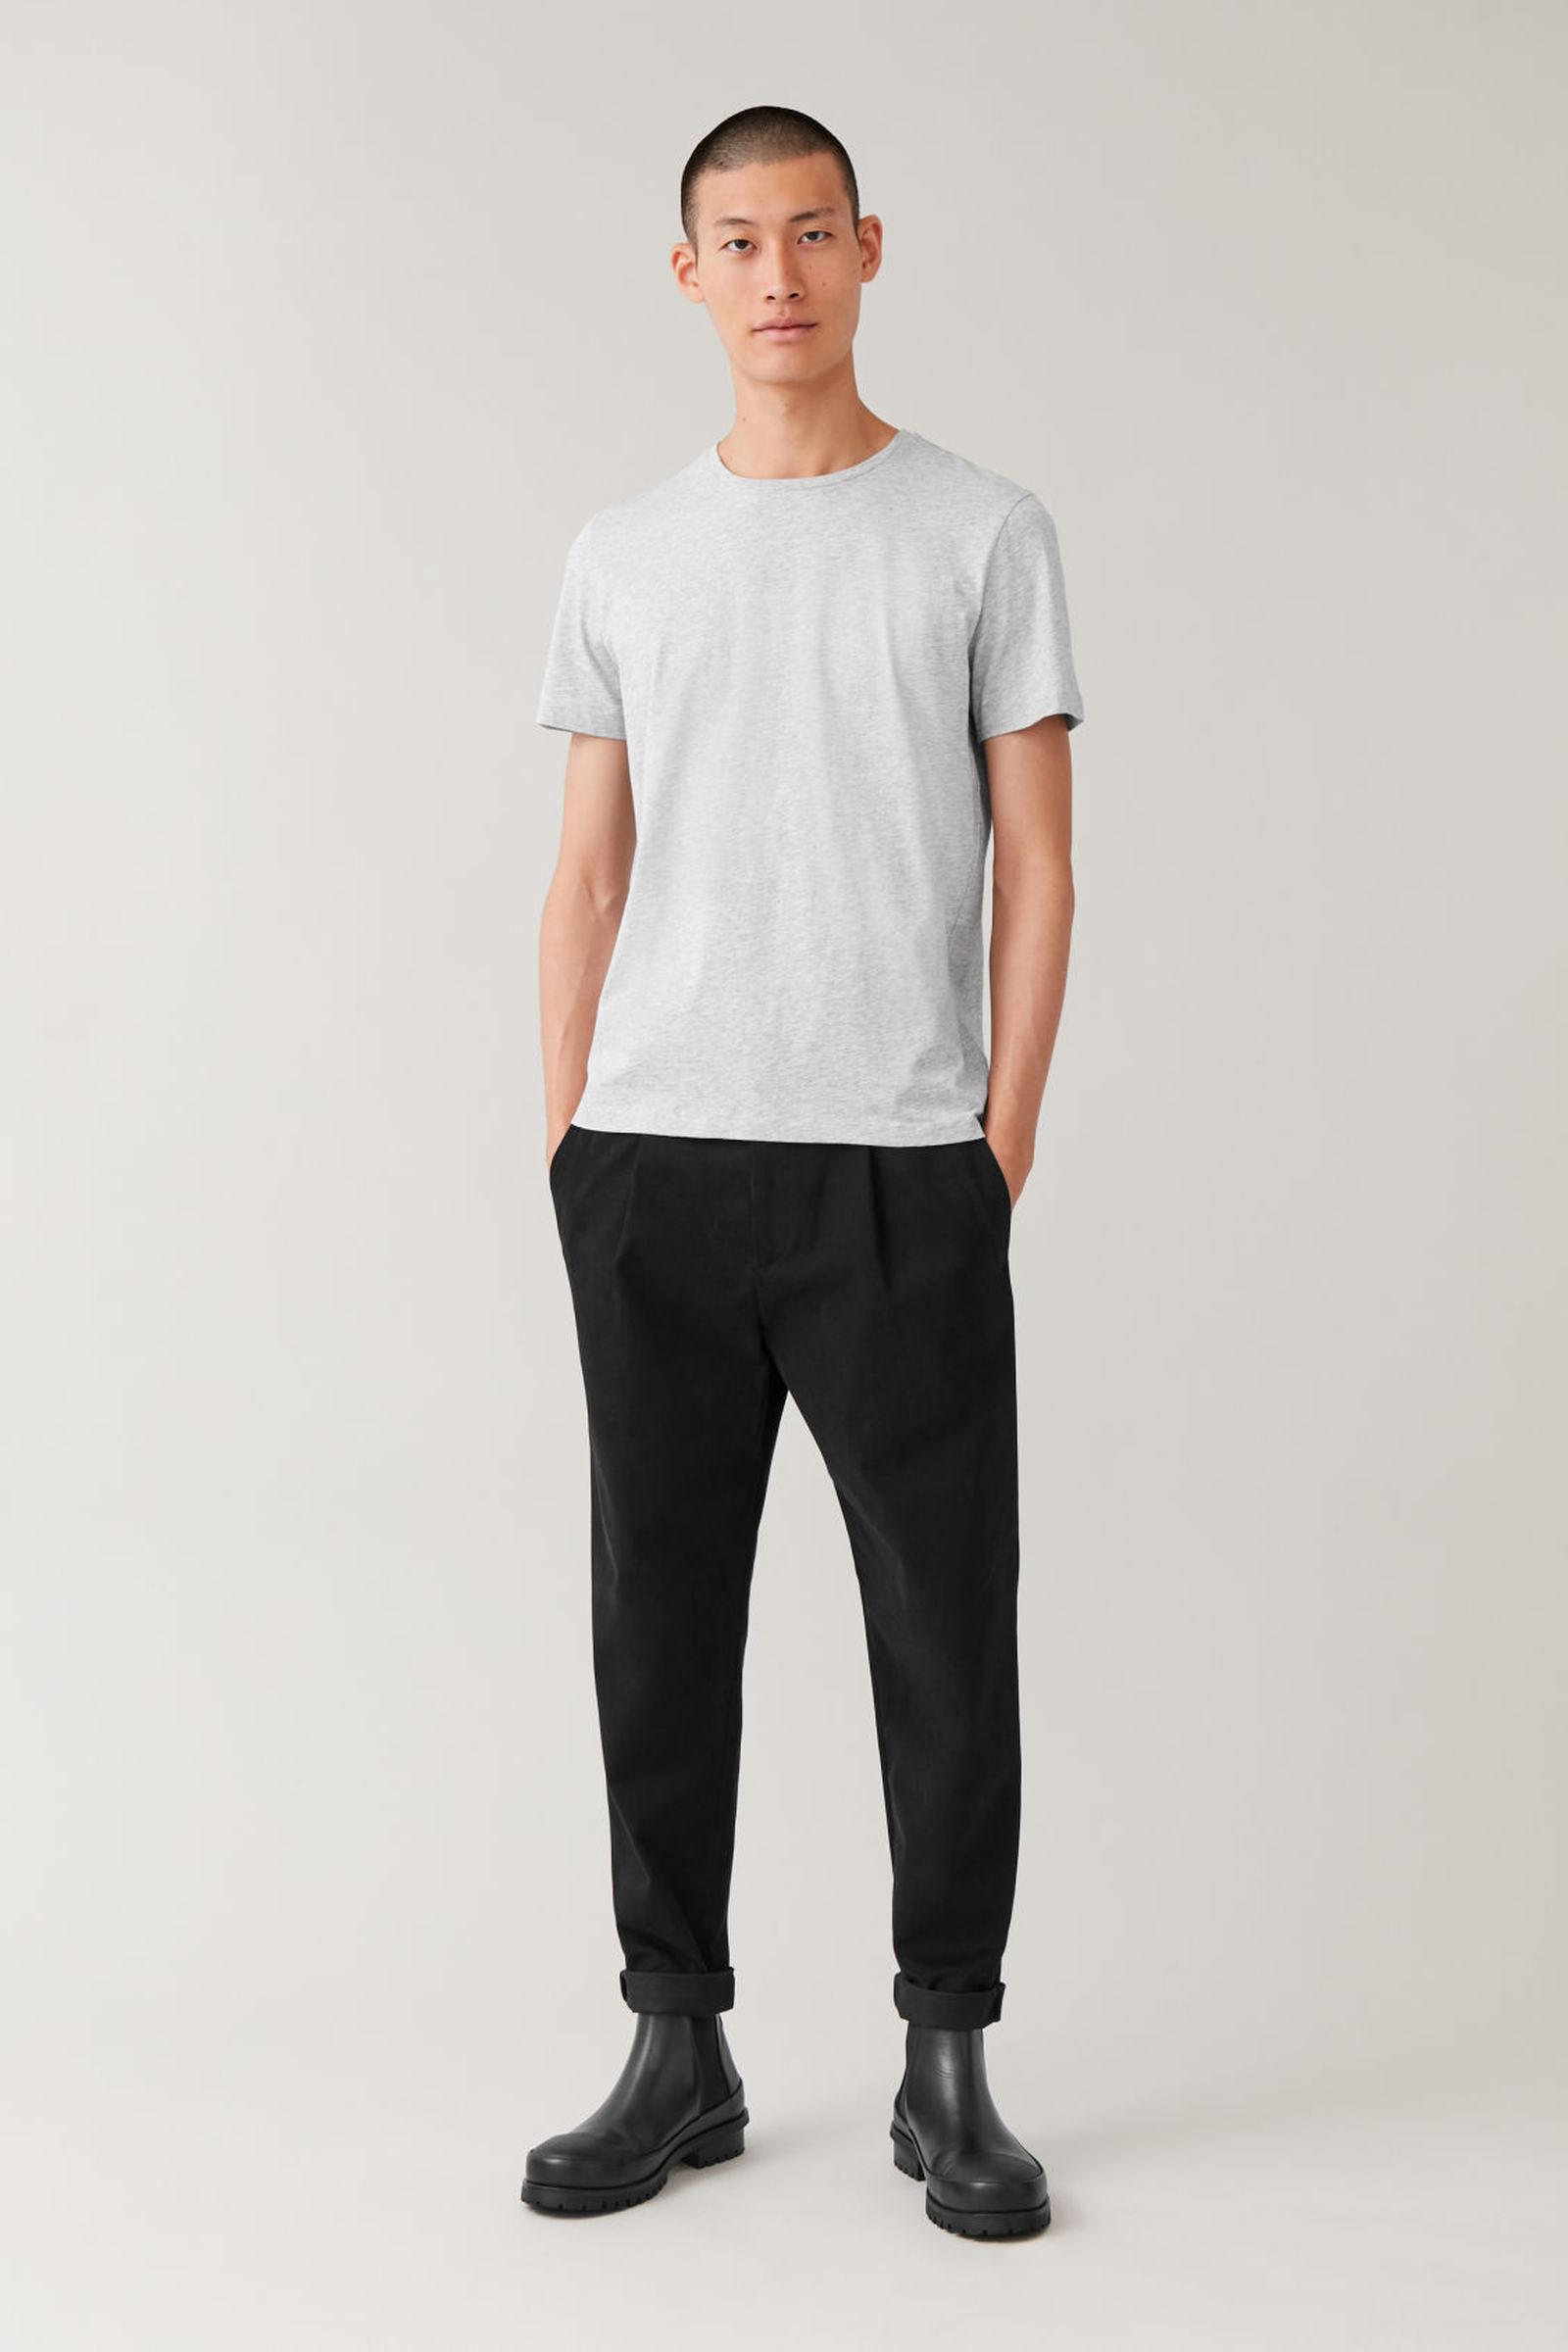 COS 라운드 넥 티셔츠의 라이트 그레이 멜란지컬러 ECOMLook입니다.